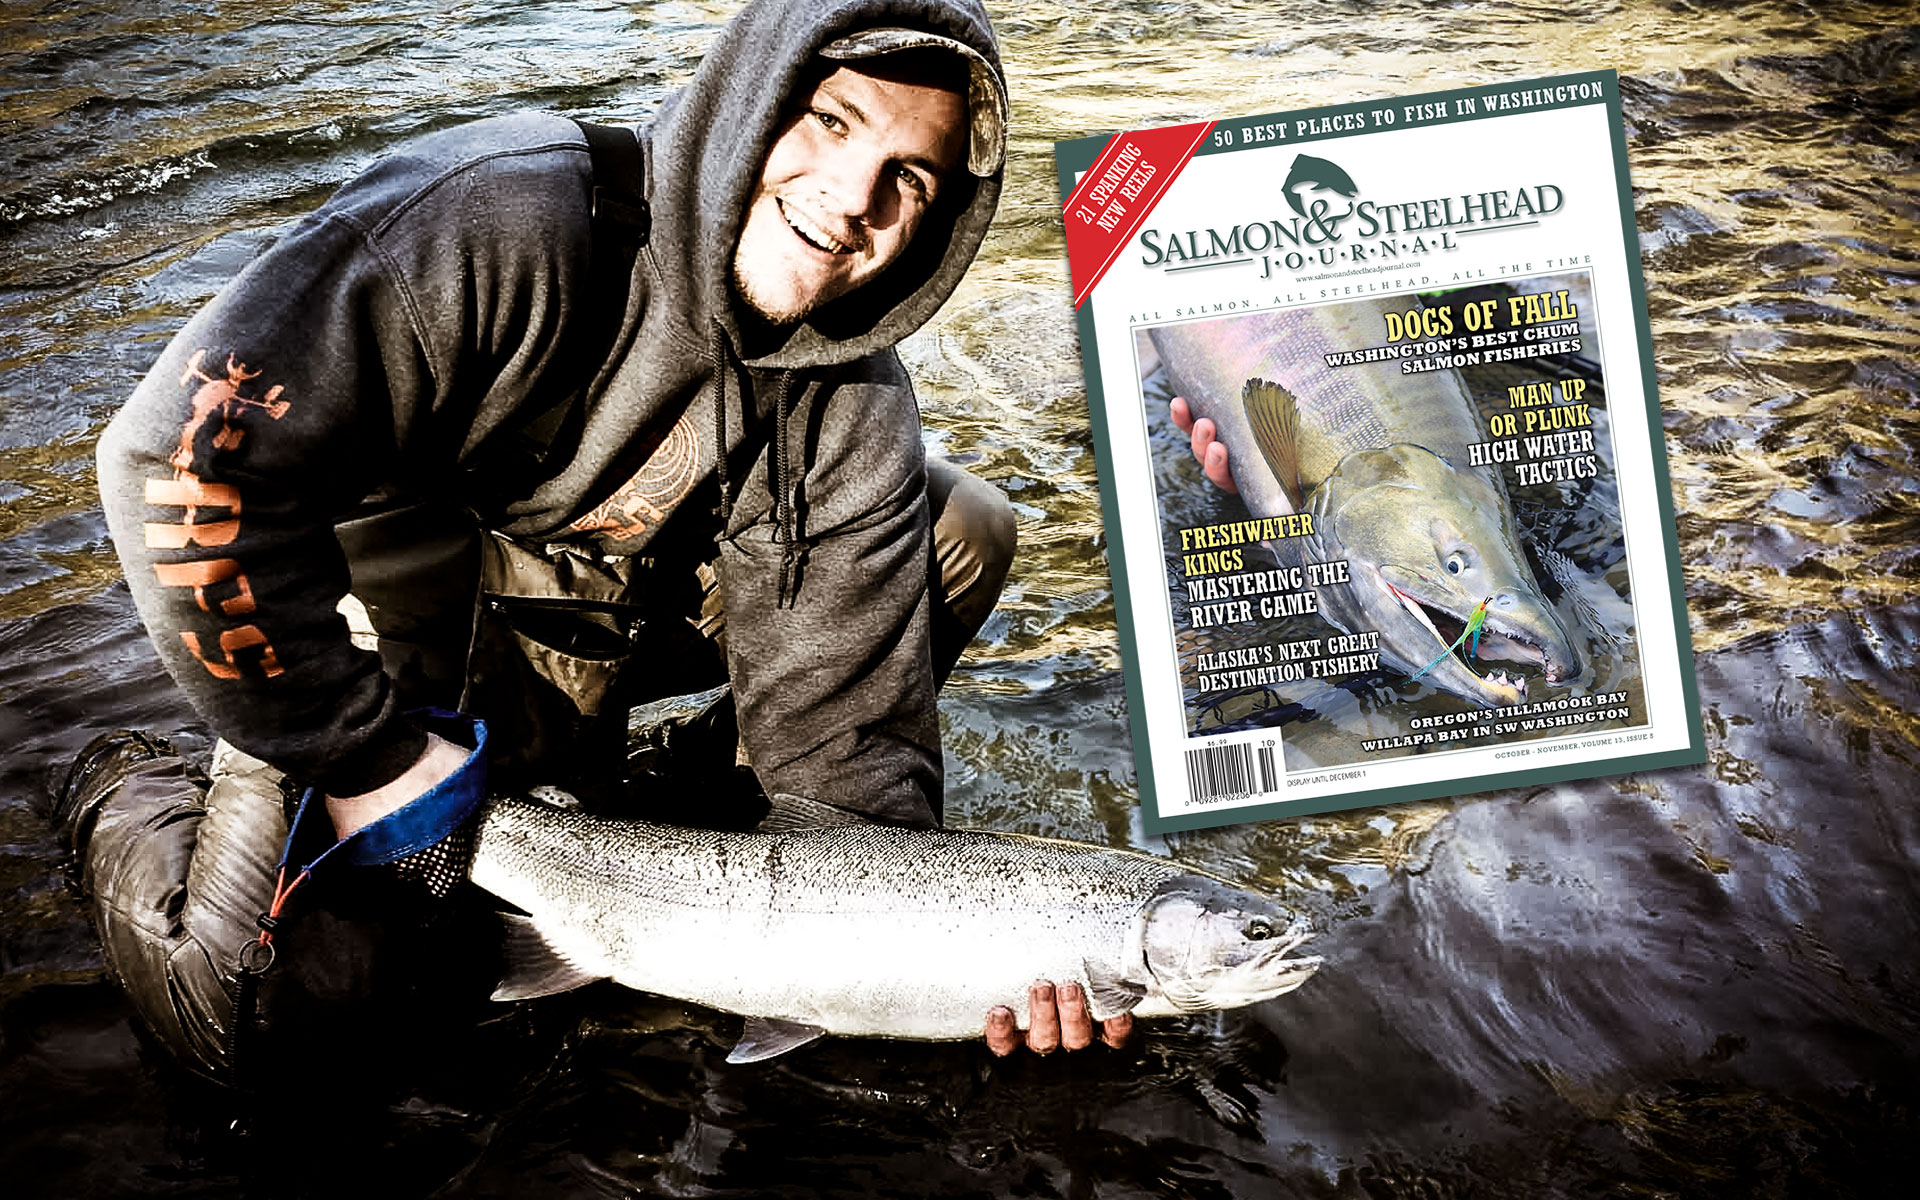 Subscribe to Salmon & Steelheaders Journal